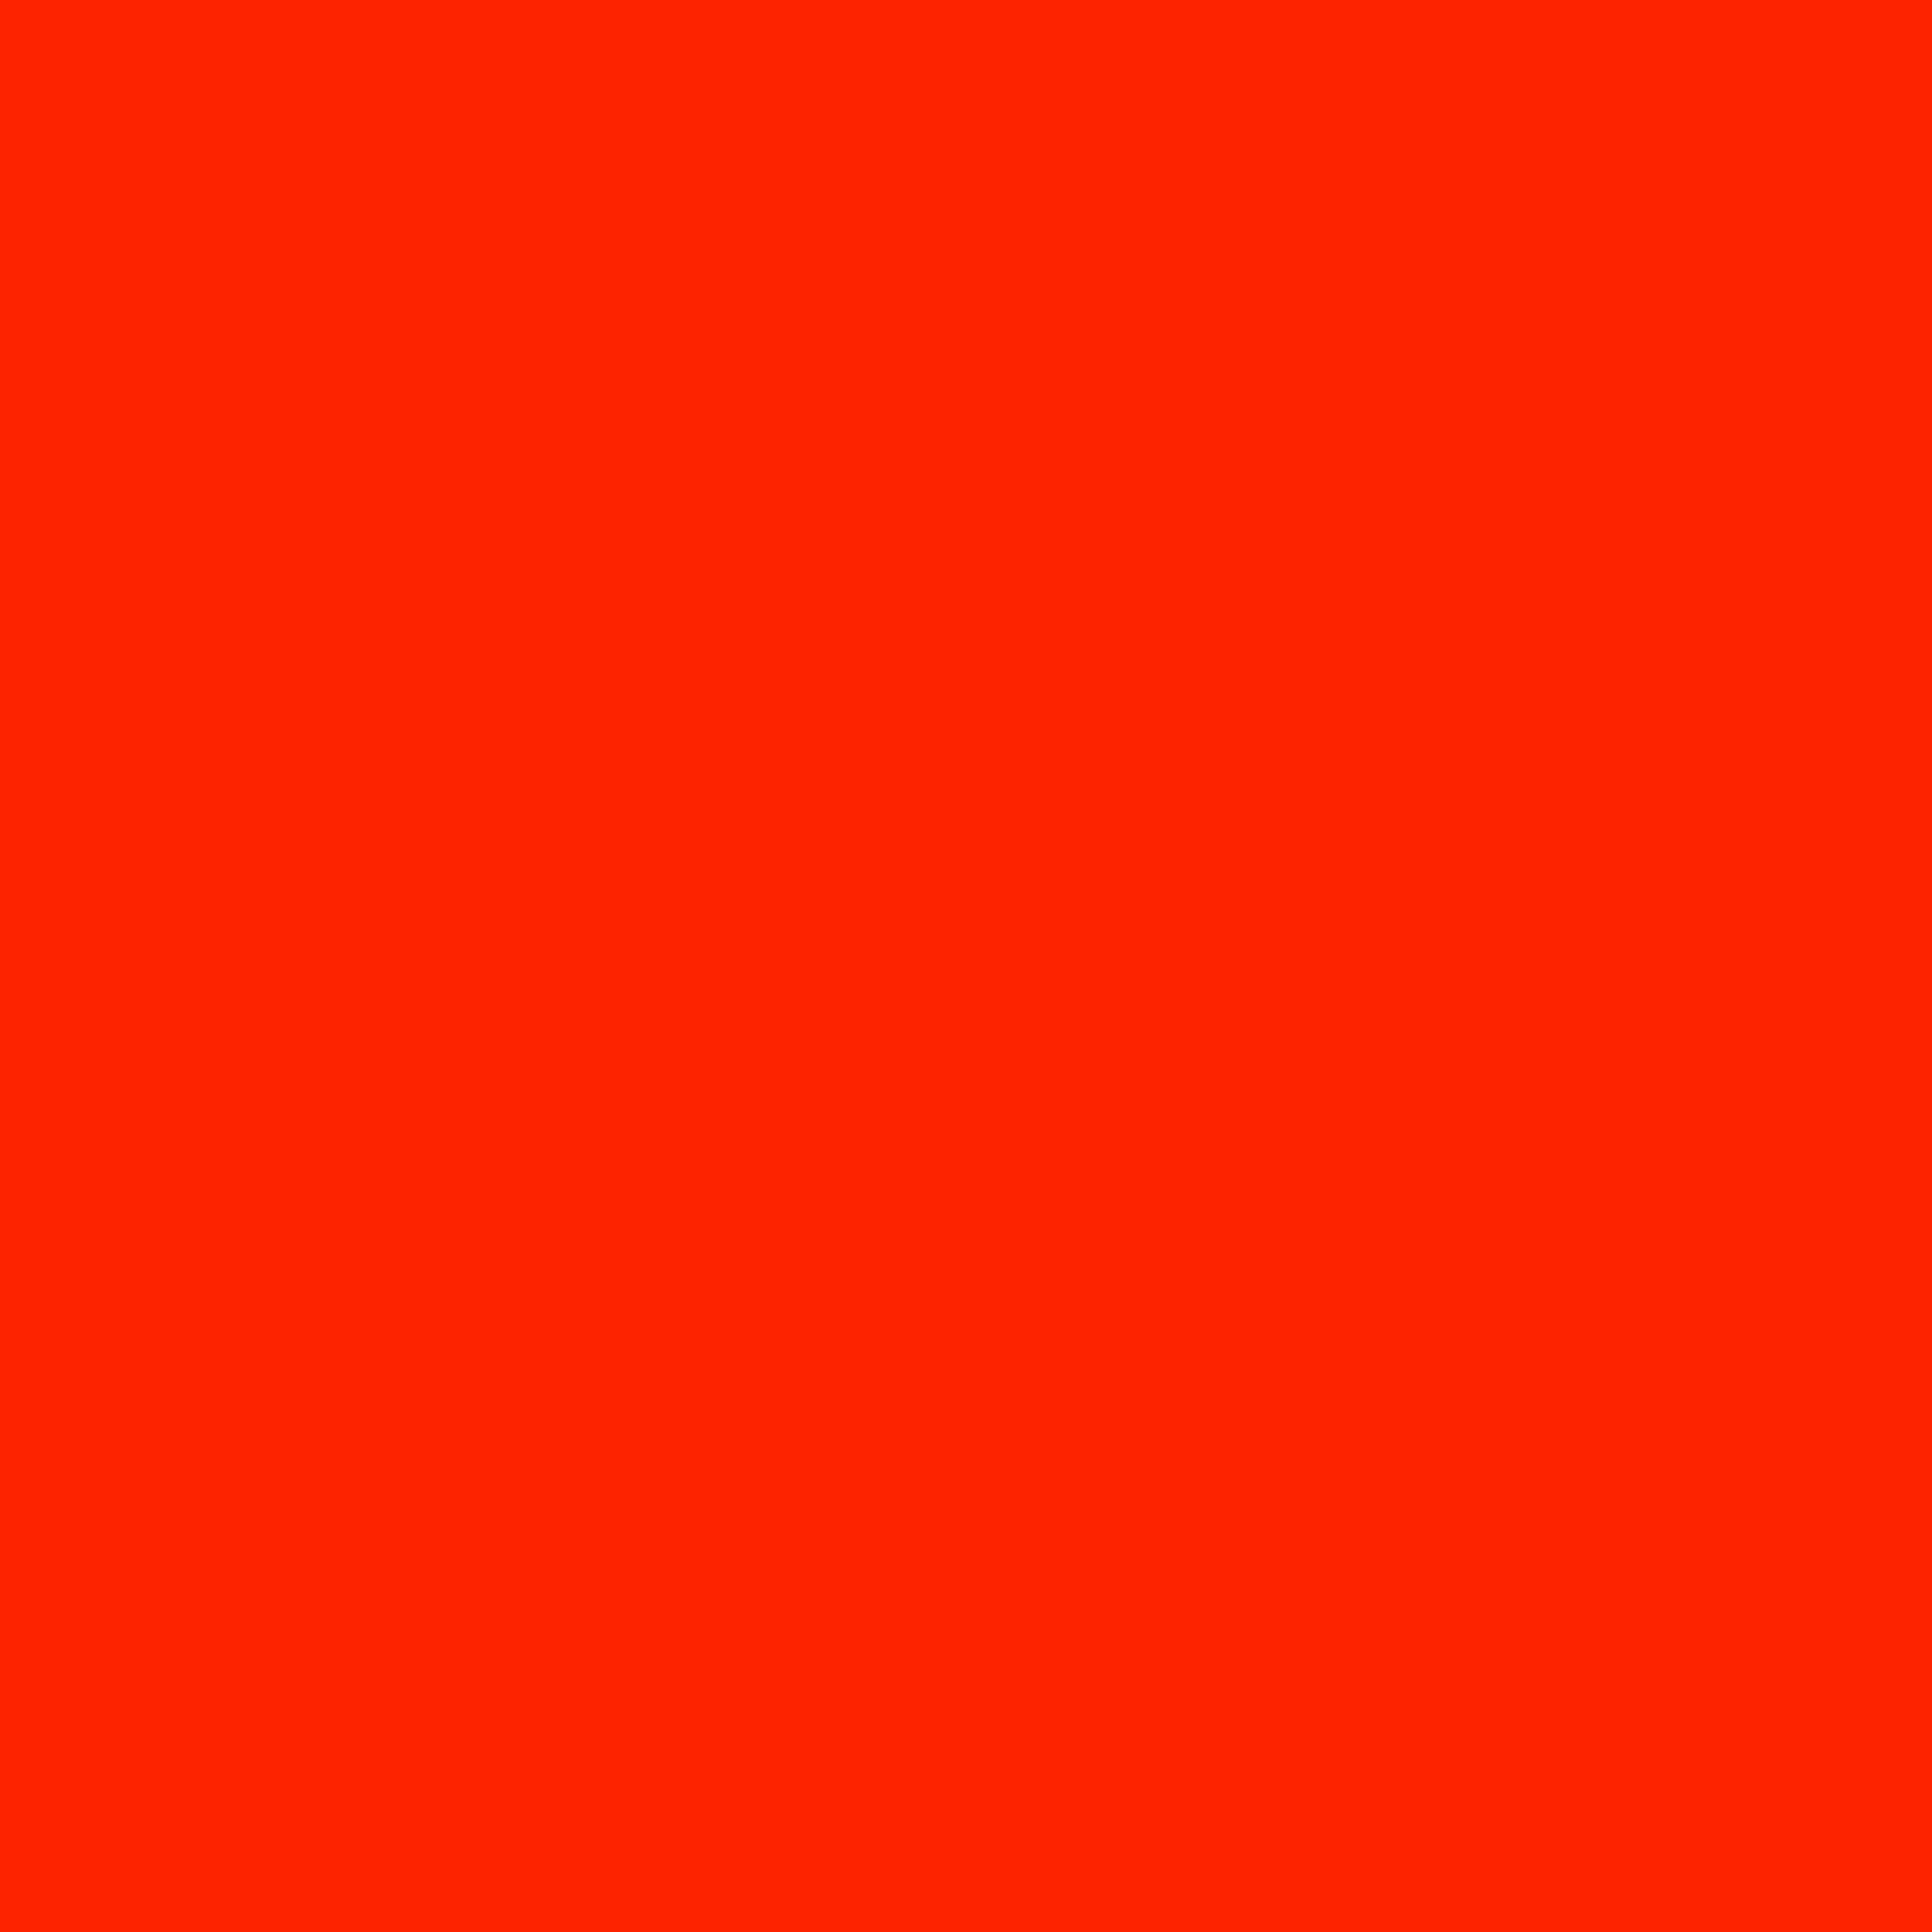 3600x3600 Scarlet Solid Color Background